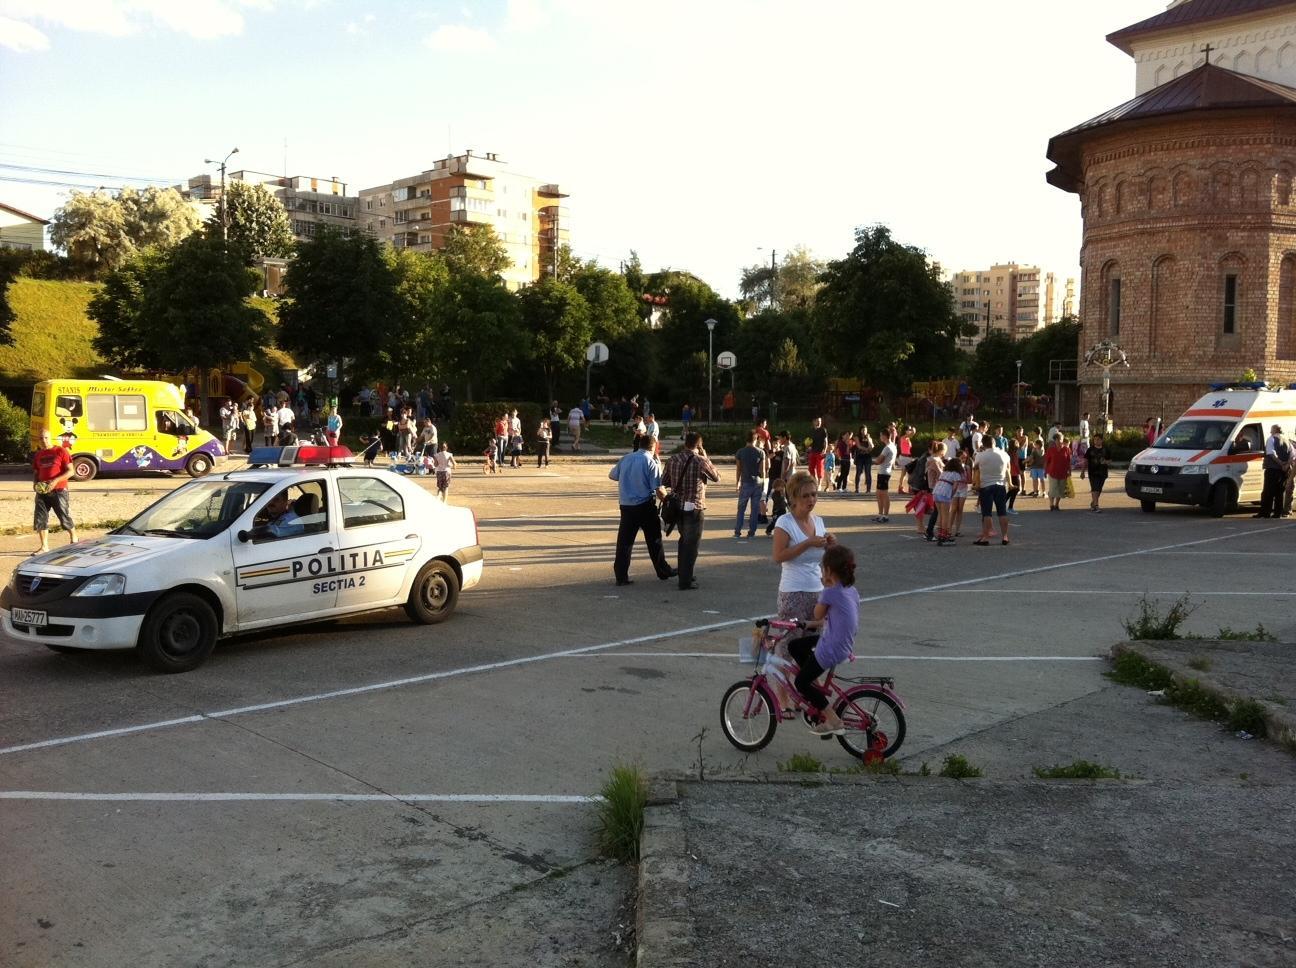 Bataie zdravana intre 6 persoane sub ochii a 50 de copii FOTO VIDEO